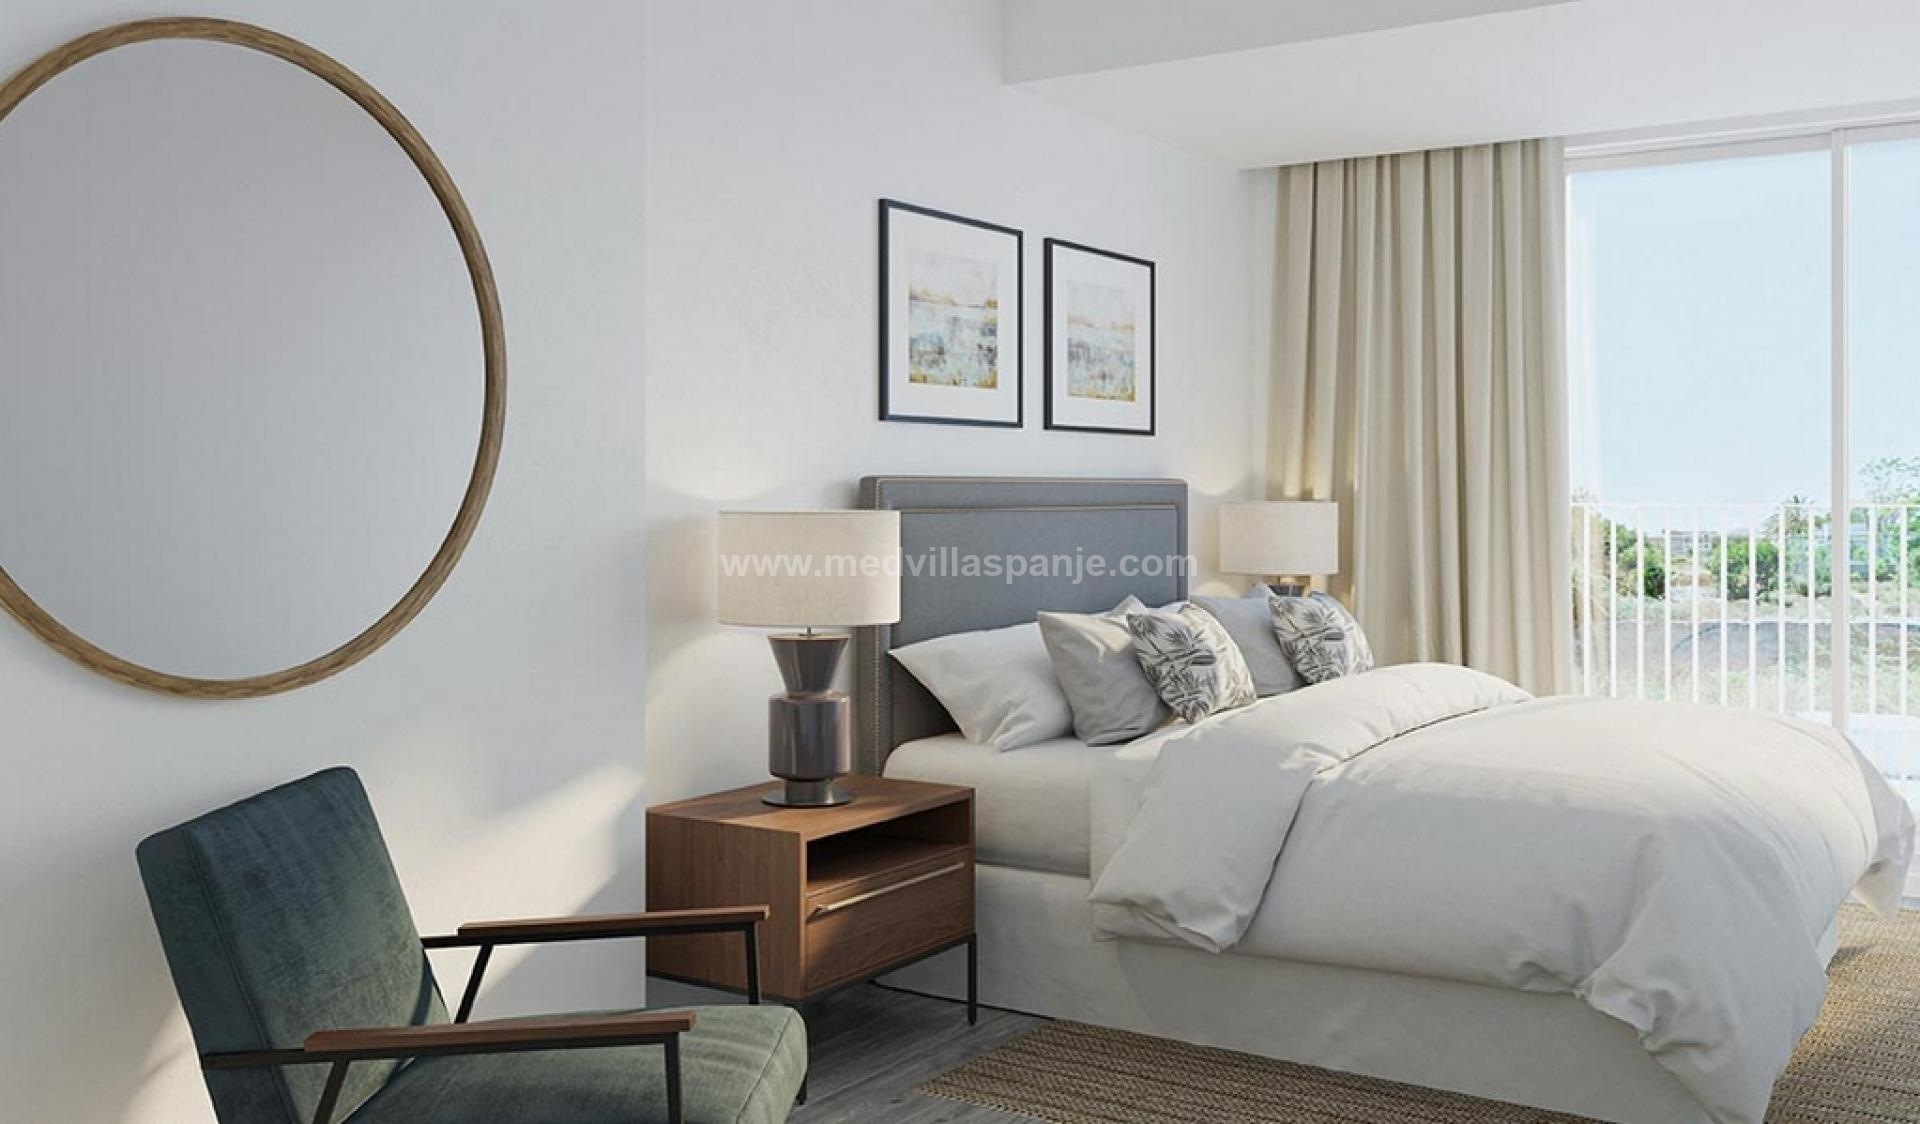 3 bedroom Apartment with terrace in Jávea - New build in Medvilla Spanje